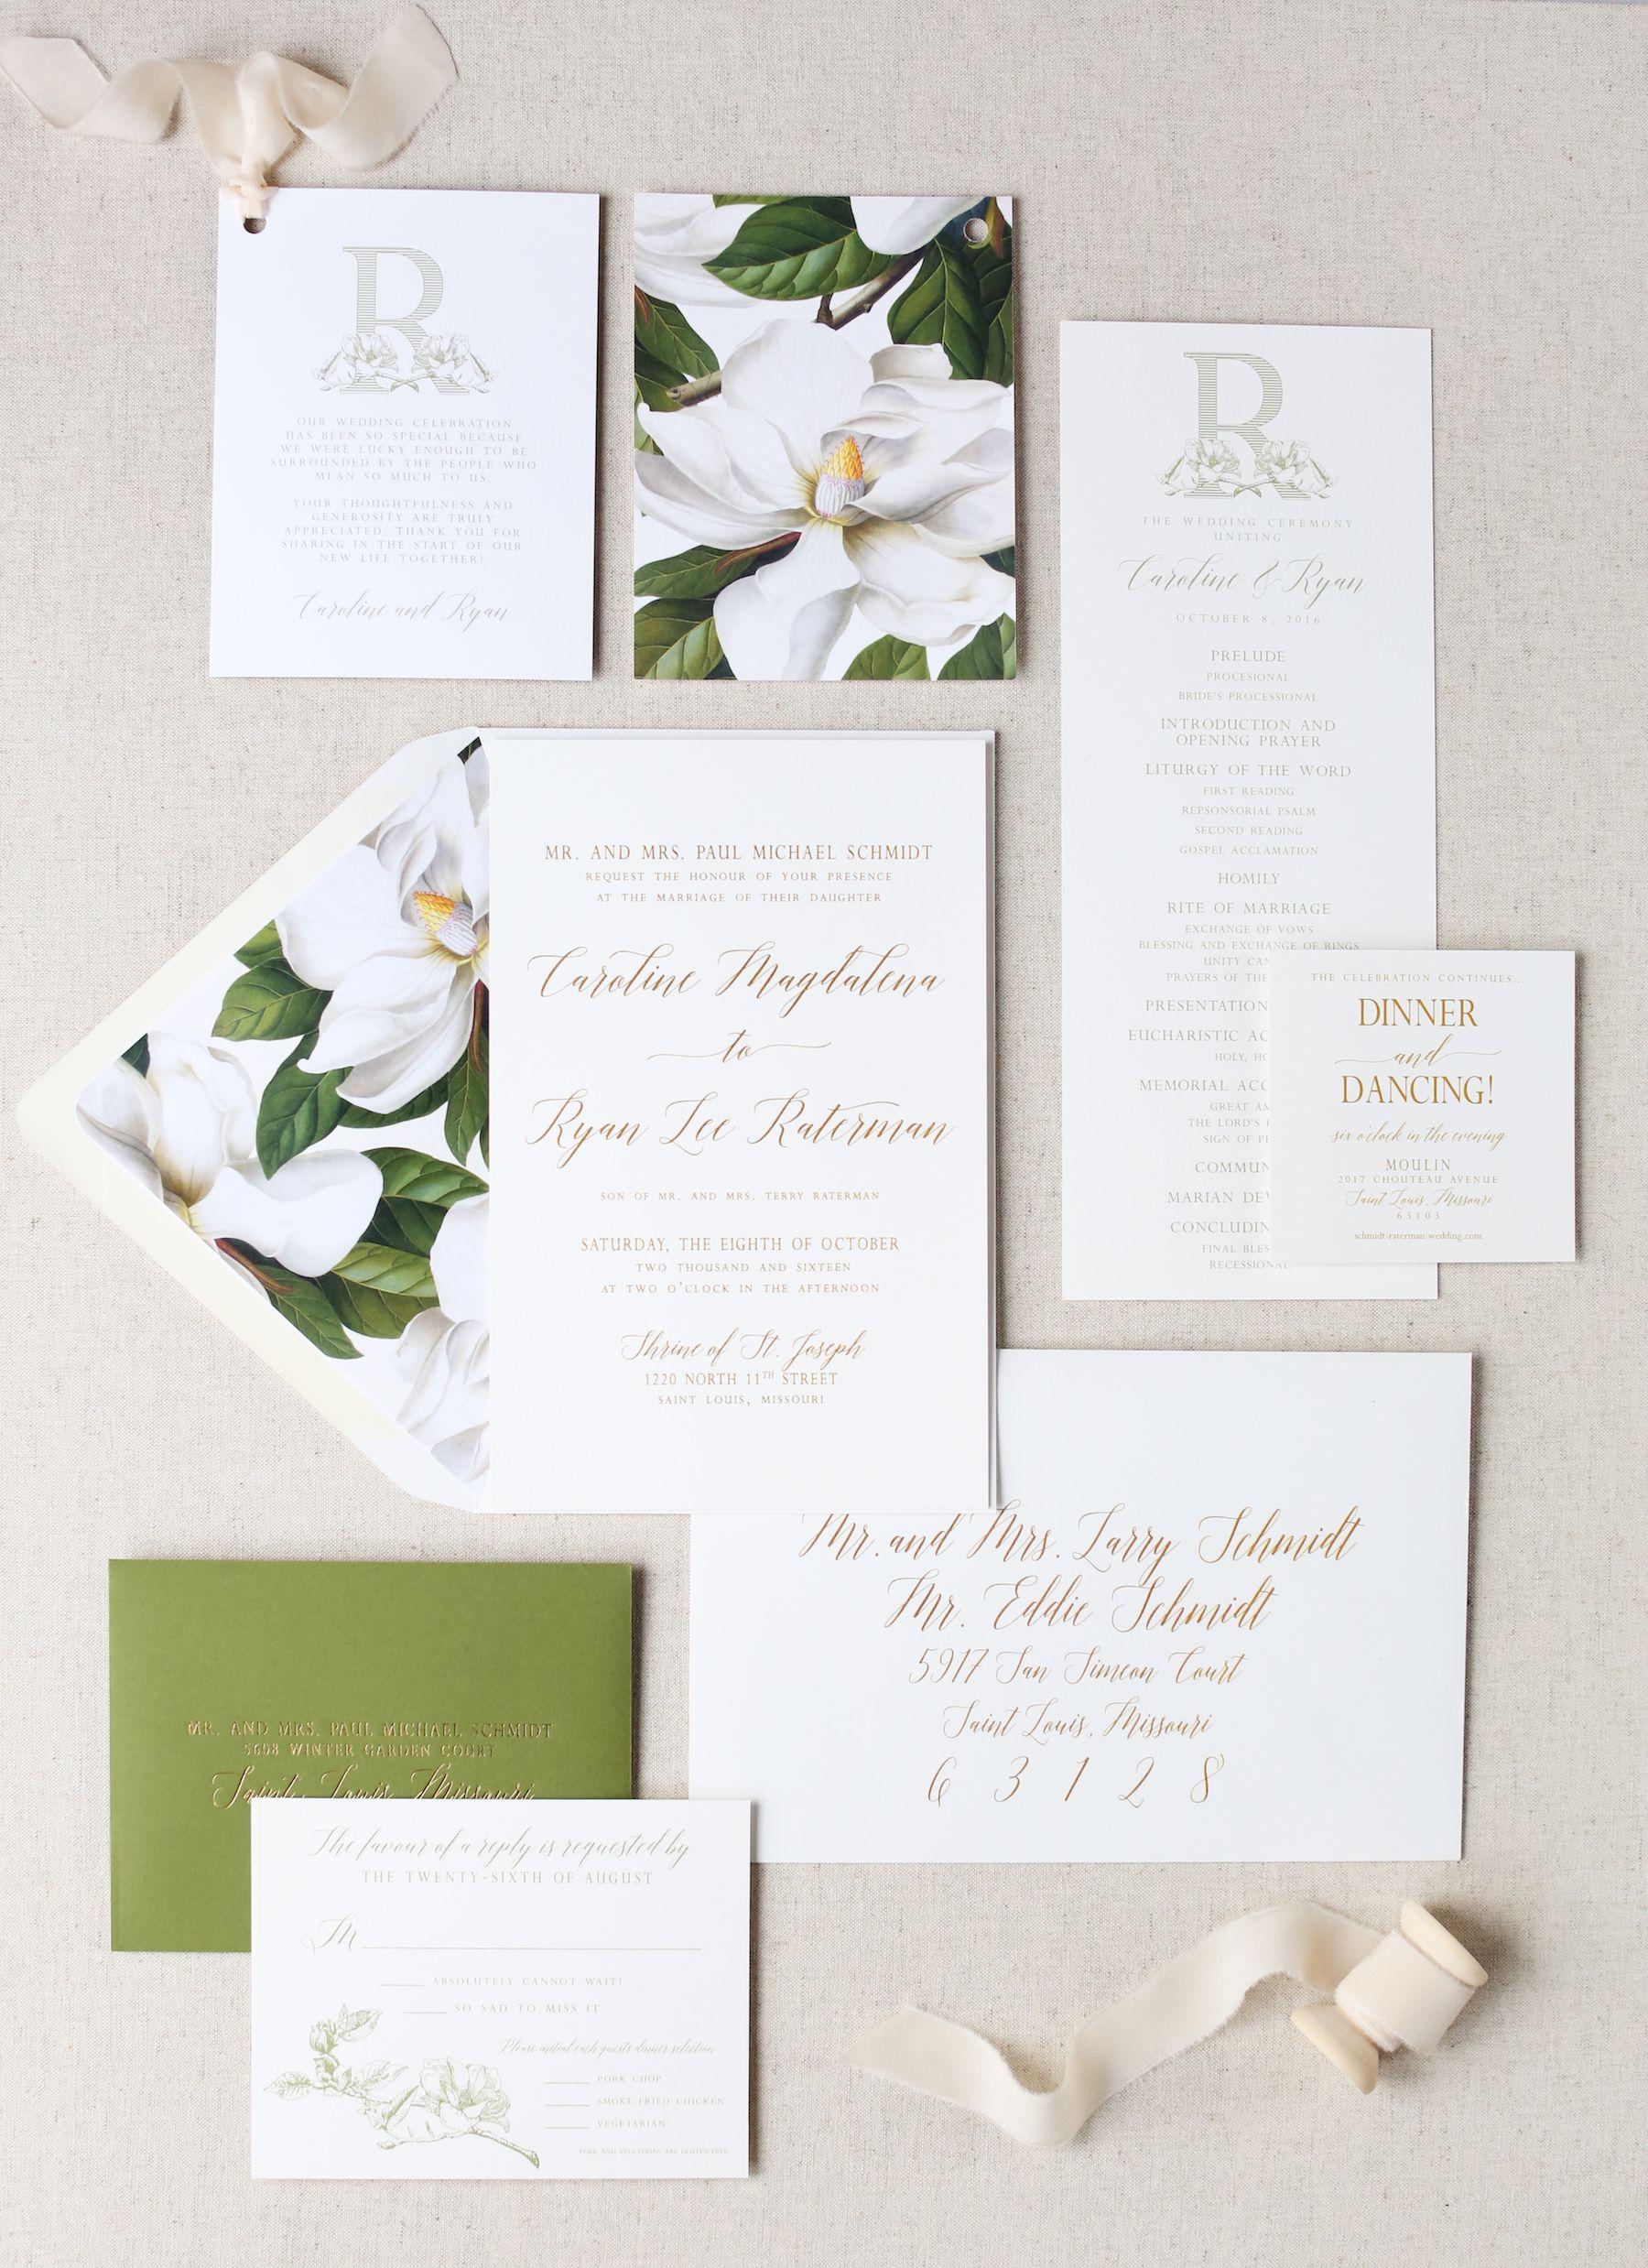 Magnolia Wedding Invitation Wedding Monogram Magnolia Monogram Magn Magnolia Wedding Invitations Green Wedding Invitations Wedding Invitations Stationery